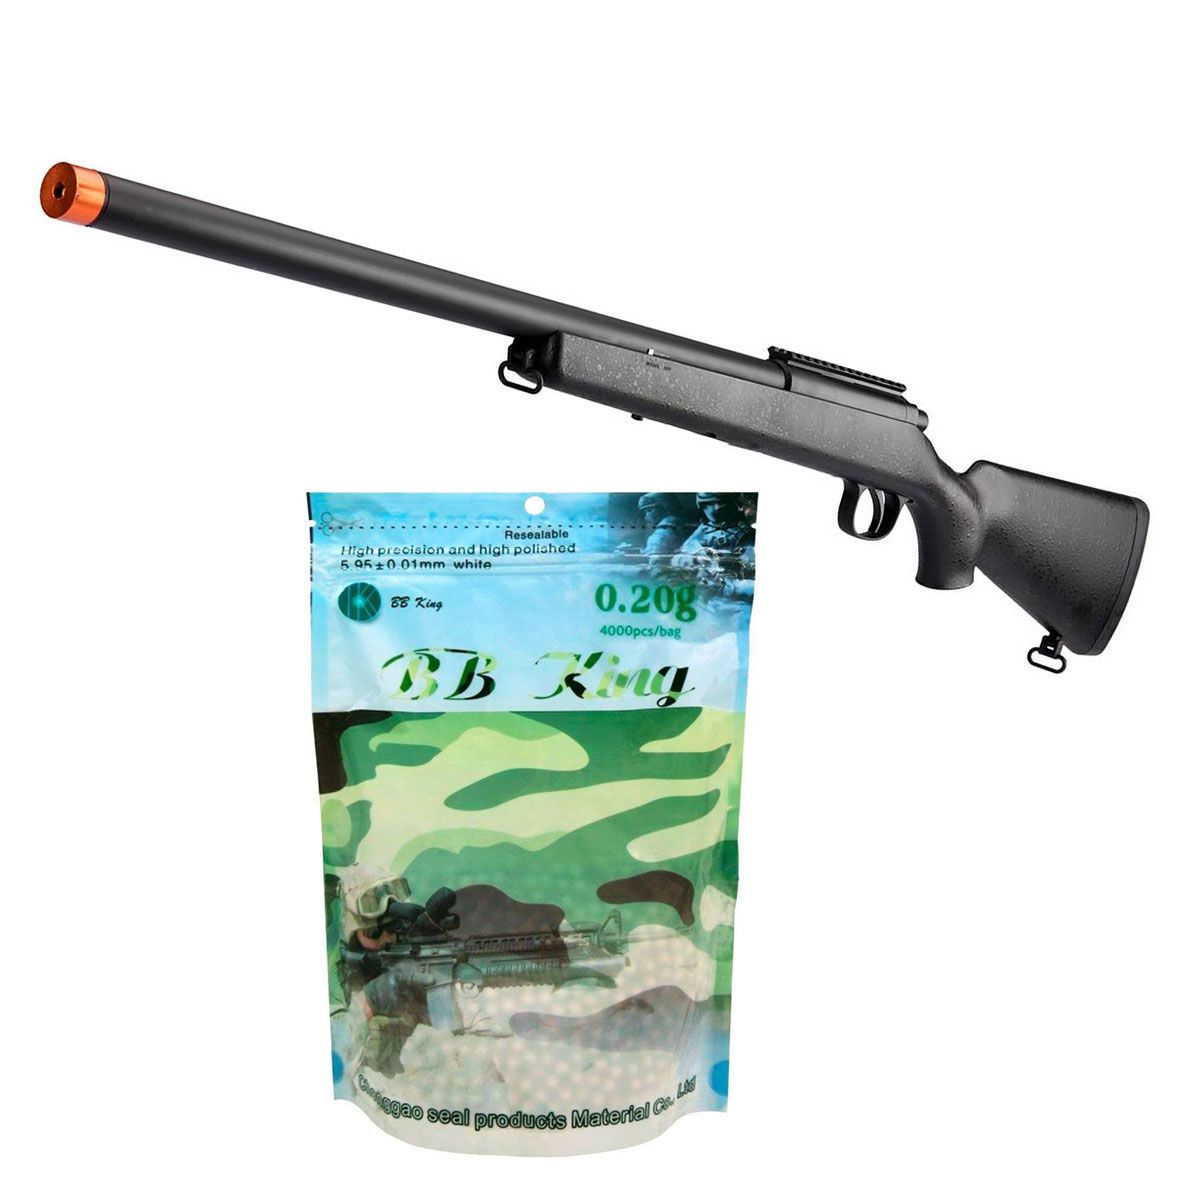 Kit Sniper Evo 6mm + BB King 0,20g